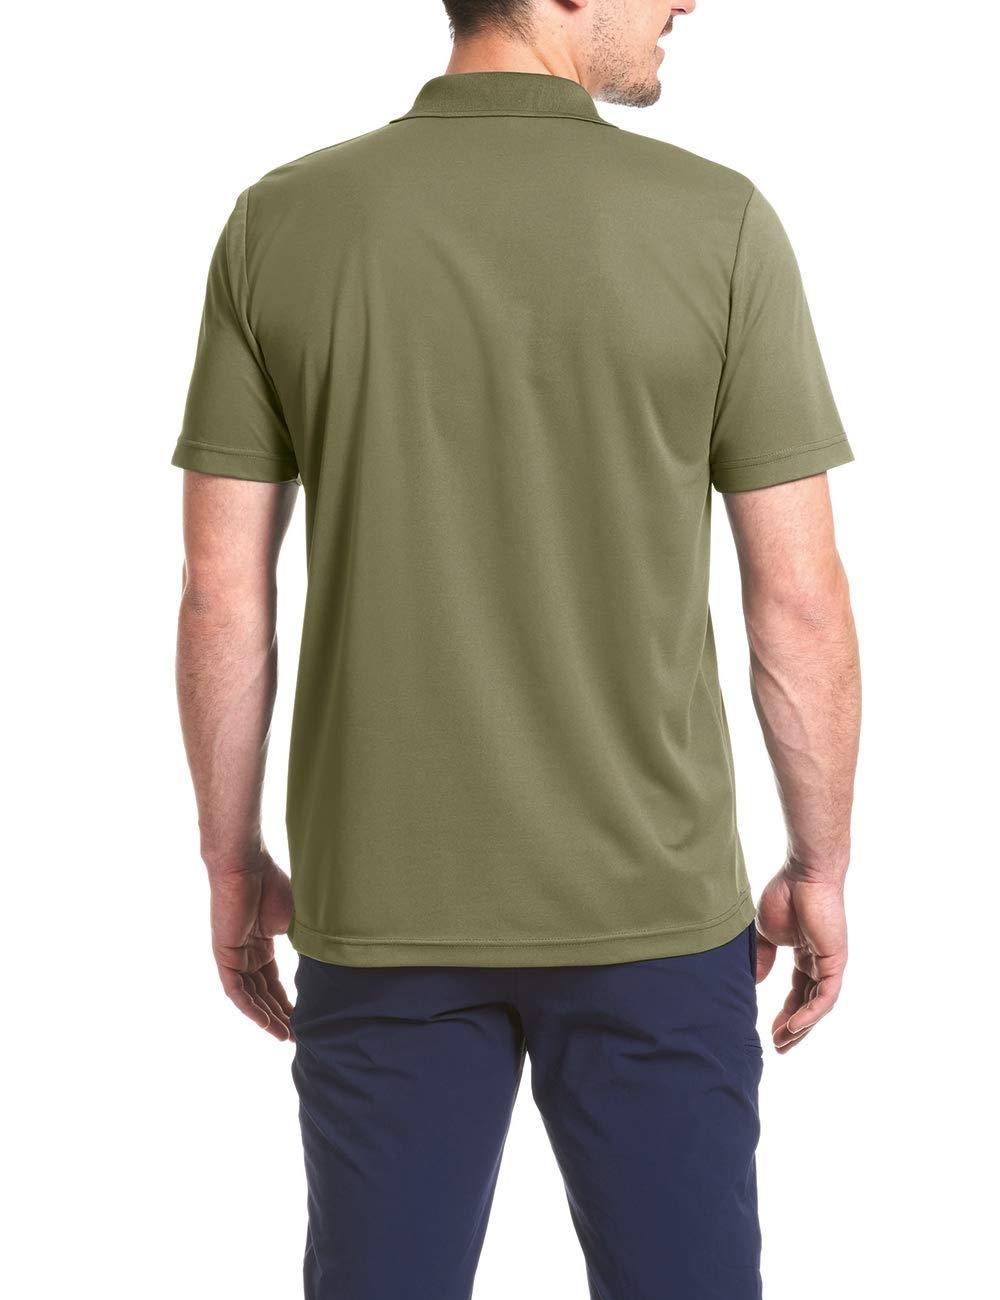 Maier Sports Hr. Arwin Polo Shirt 152306-281